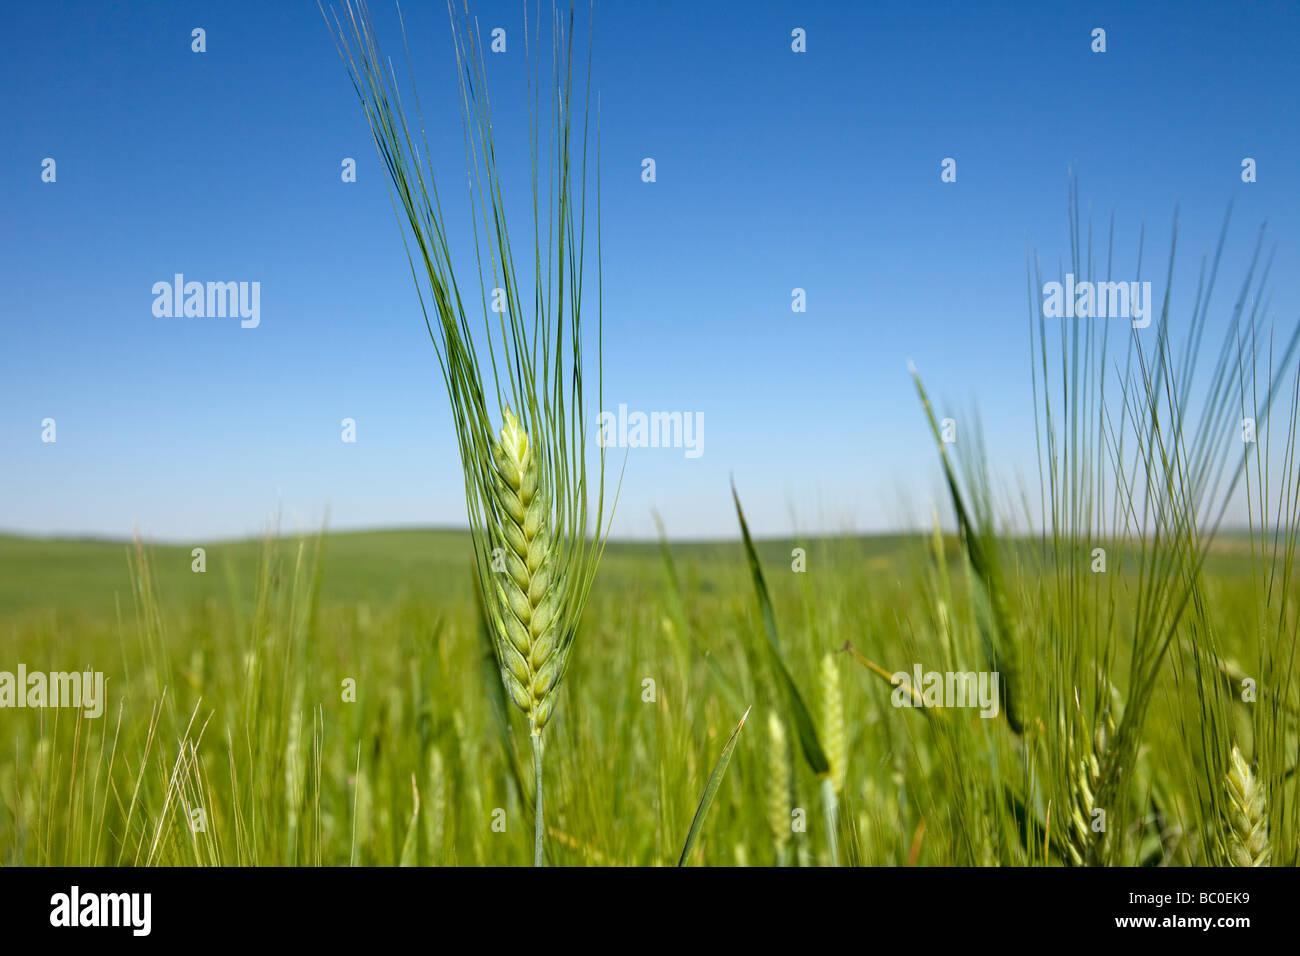 Espiga de Trigo grano spike Immagini Stock